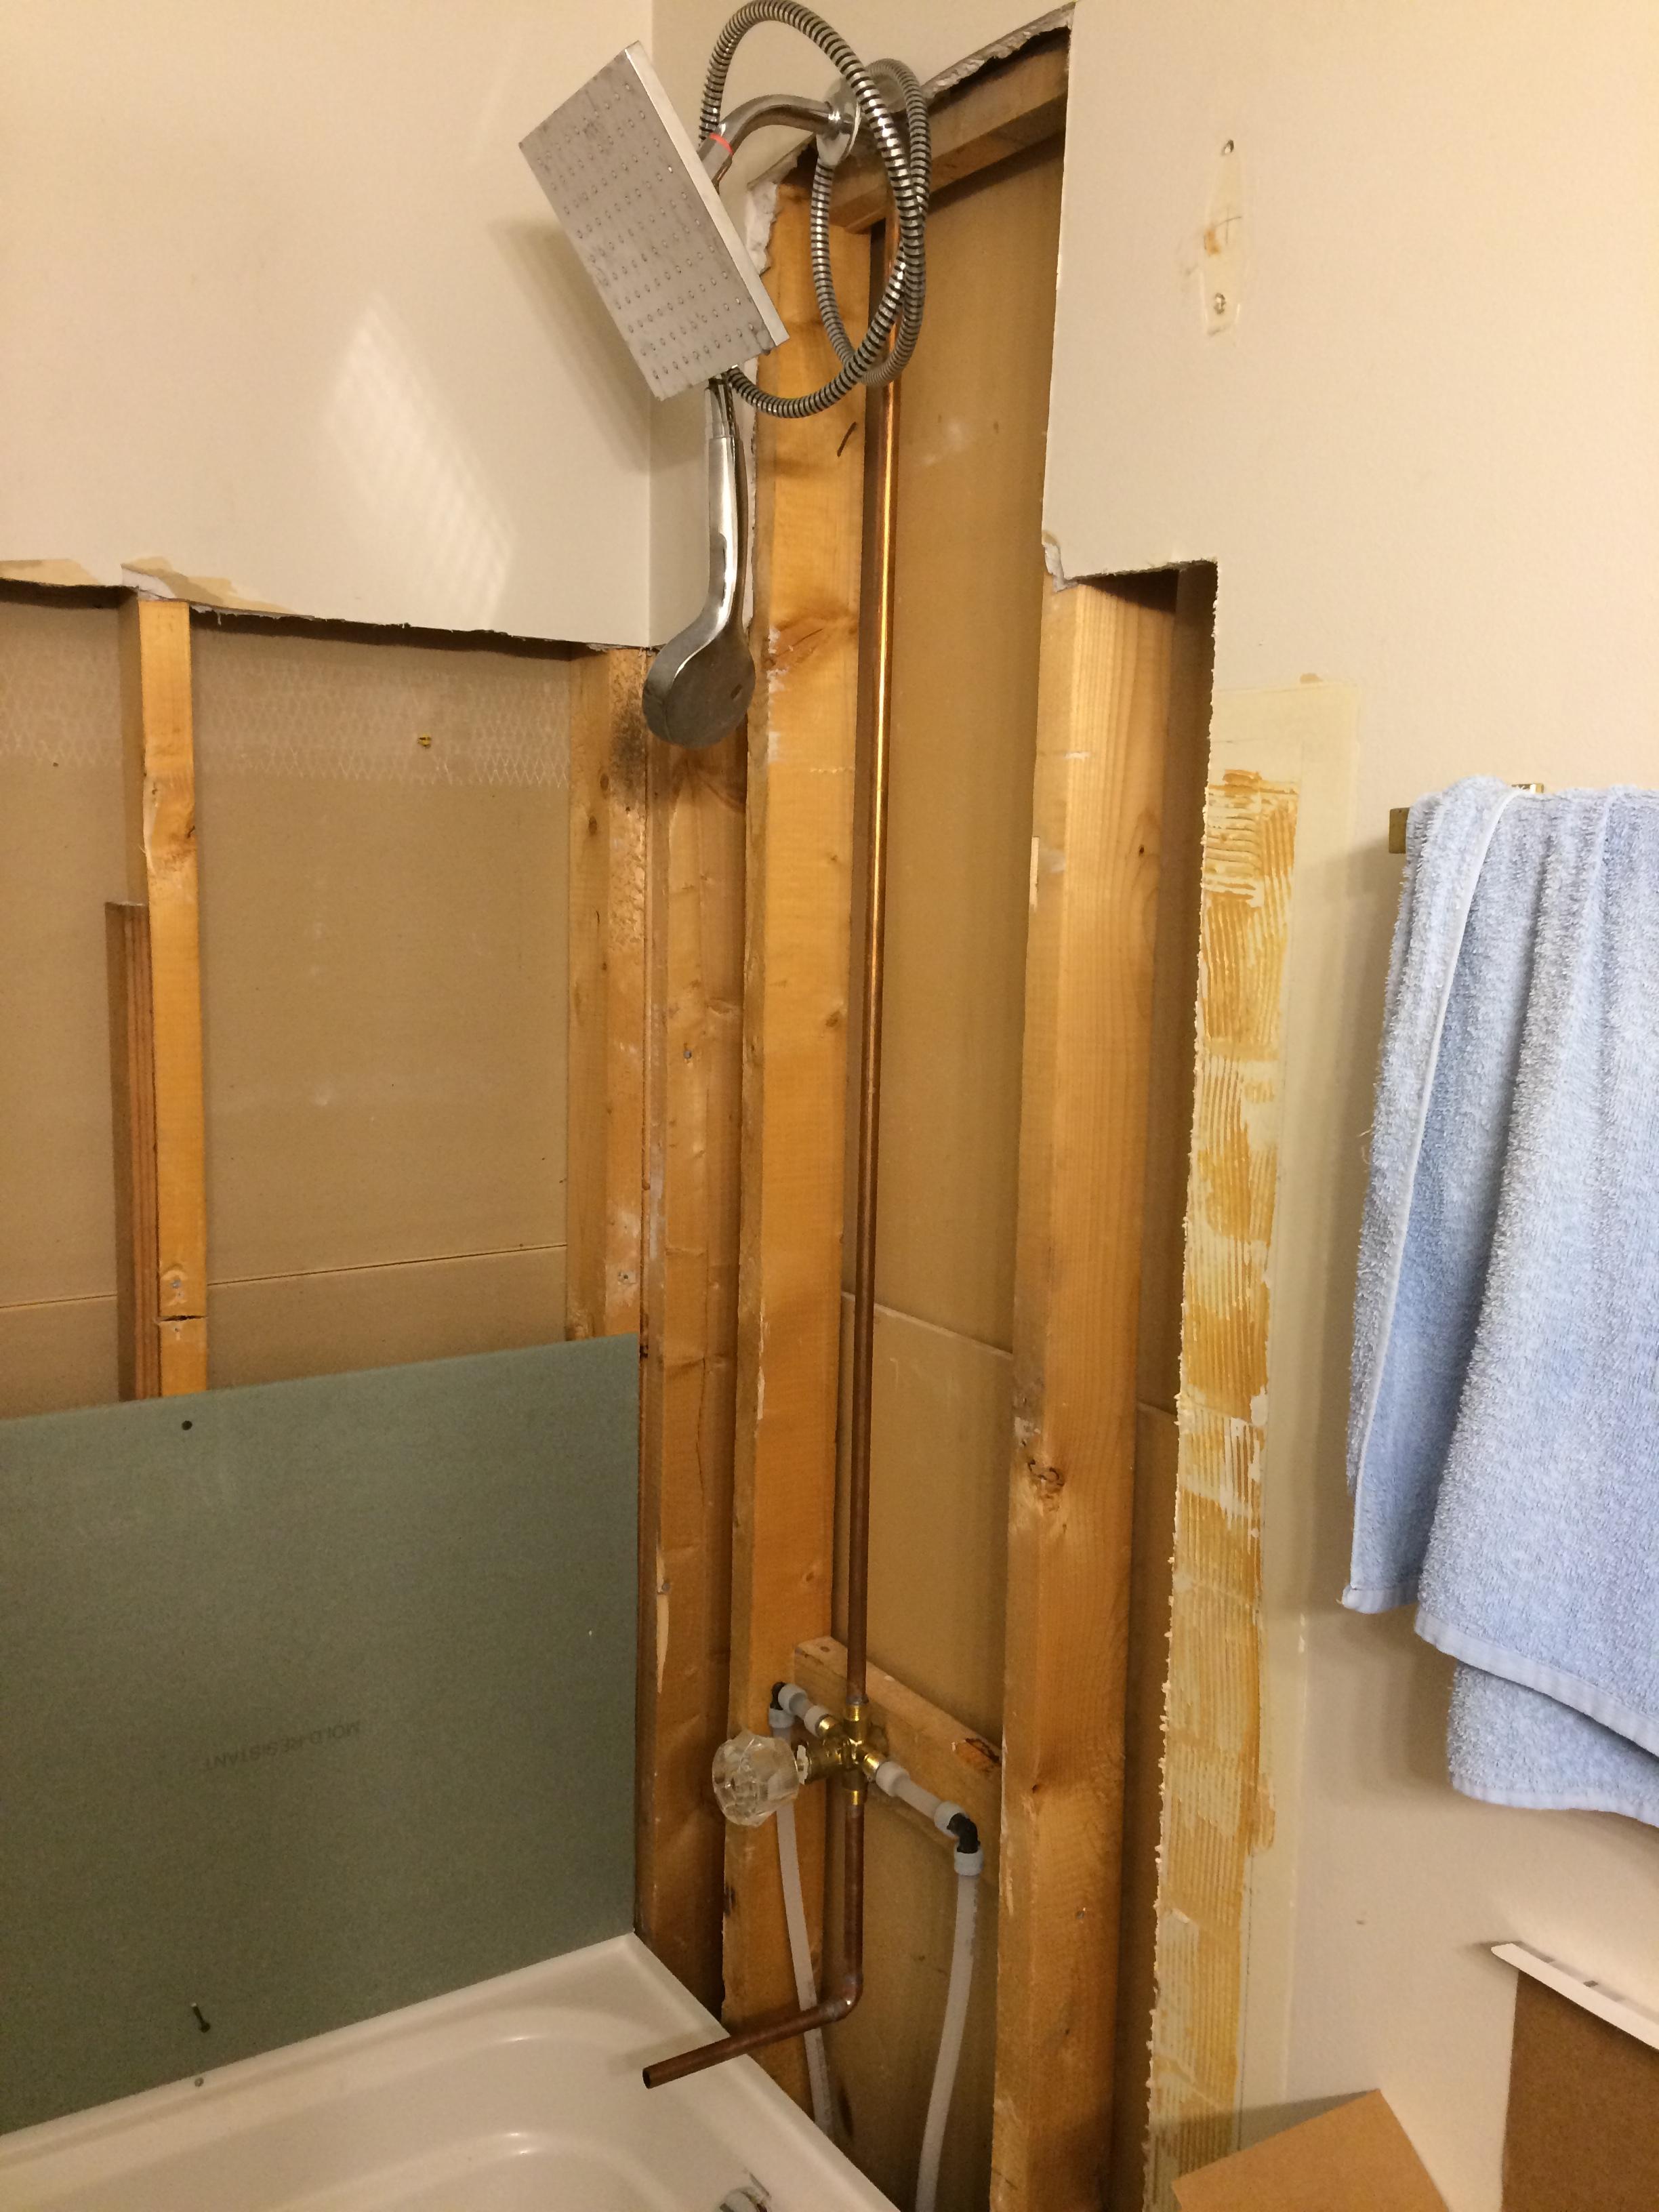 Bathroom tub surround reno (during)